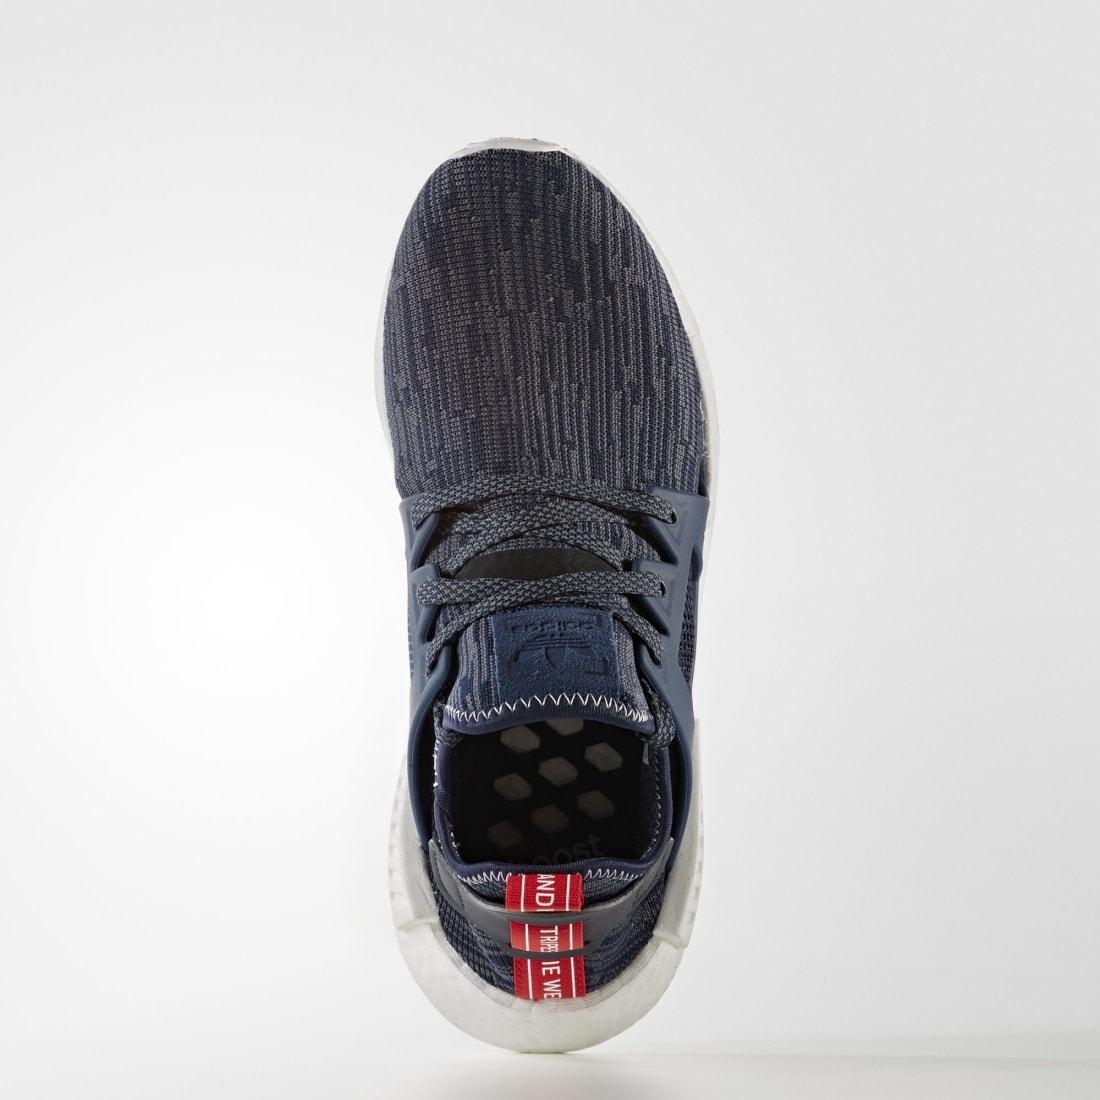 Lightweight Adidas Originals NMD XR1 Olive online shop